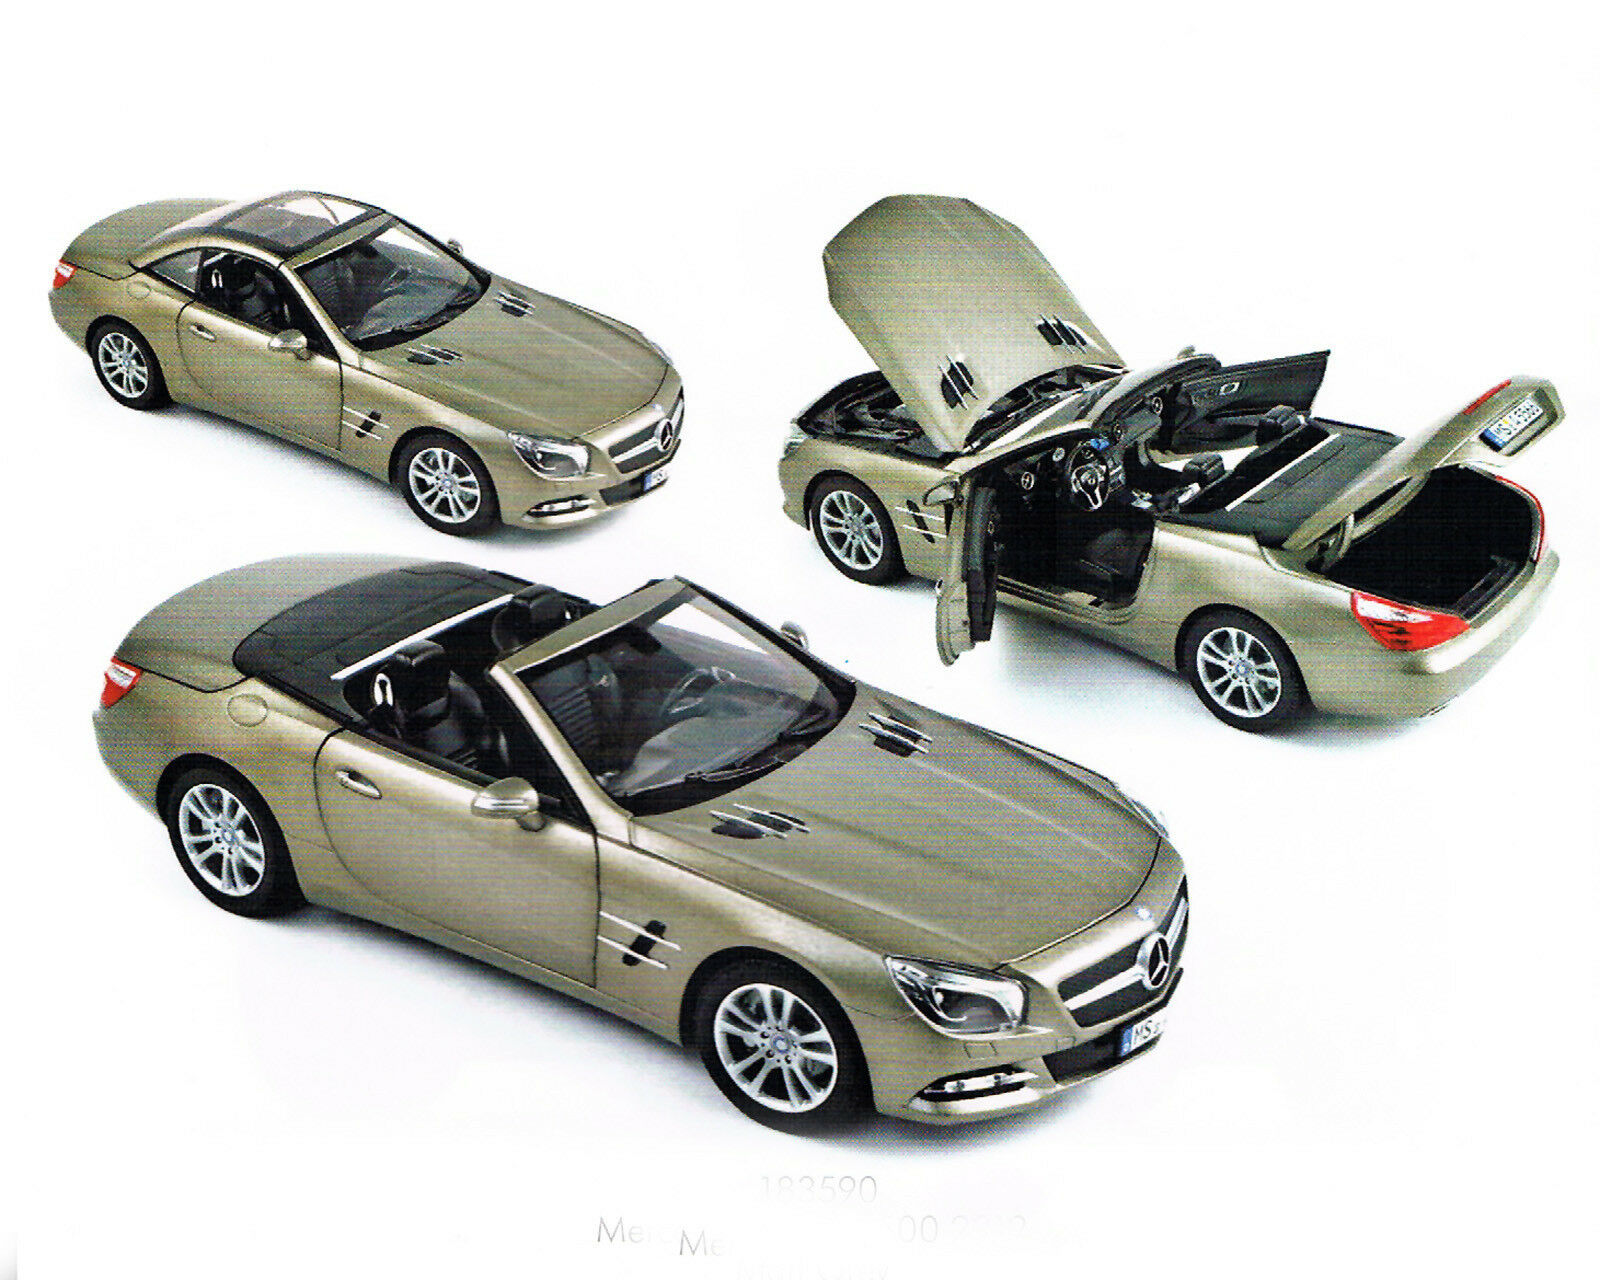 MERCEDES Benz sl 500 cabriolet, 1 18, Norev